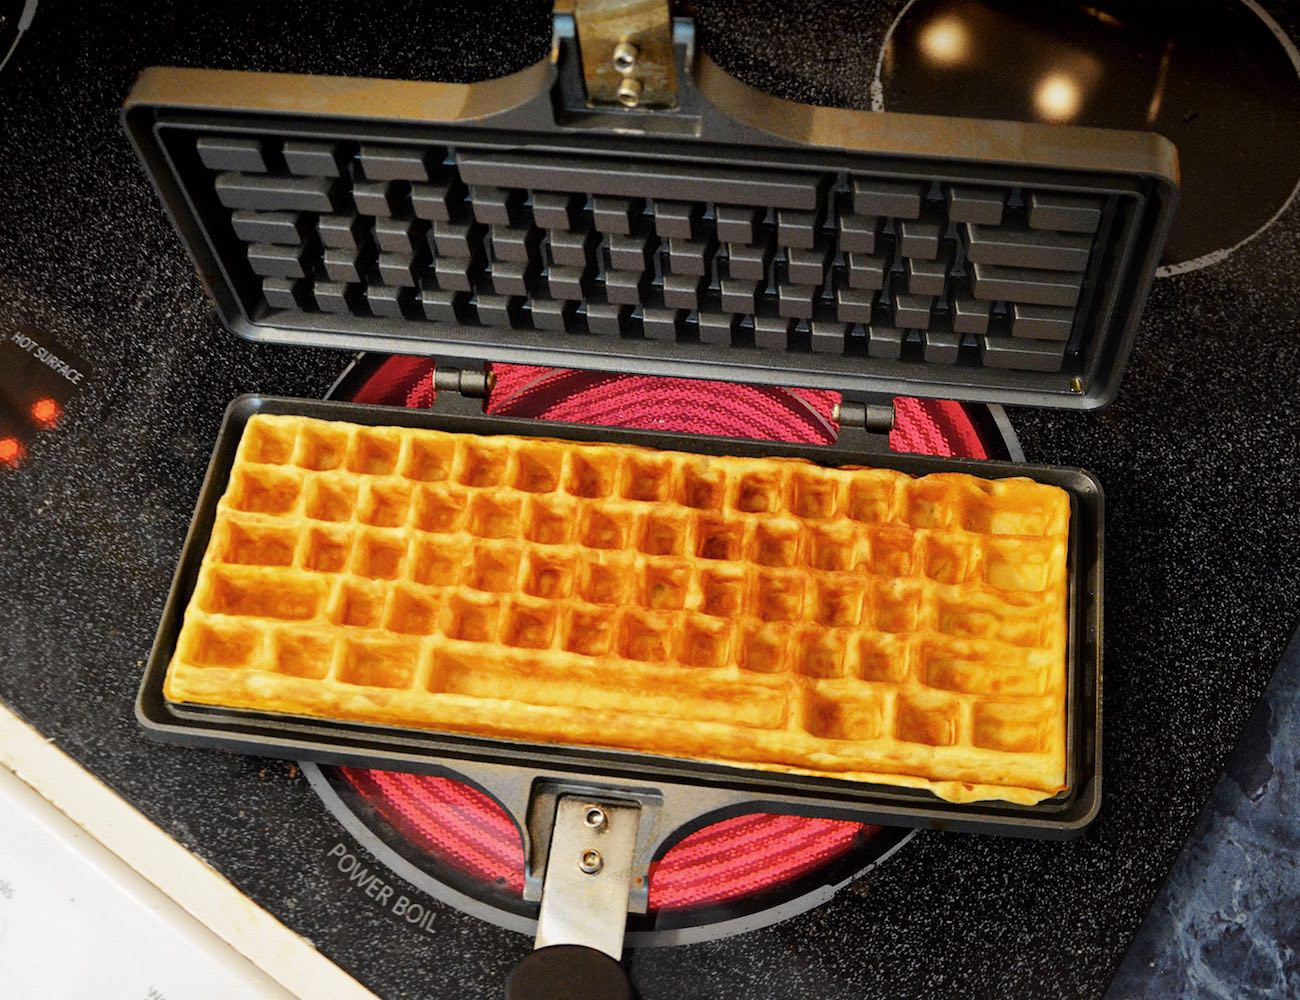 keyboard-waffle-maker-01